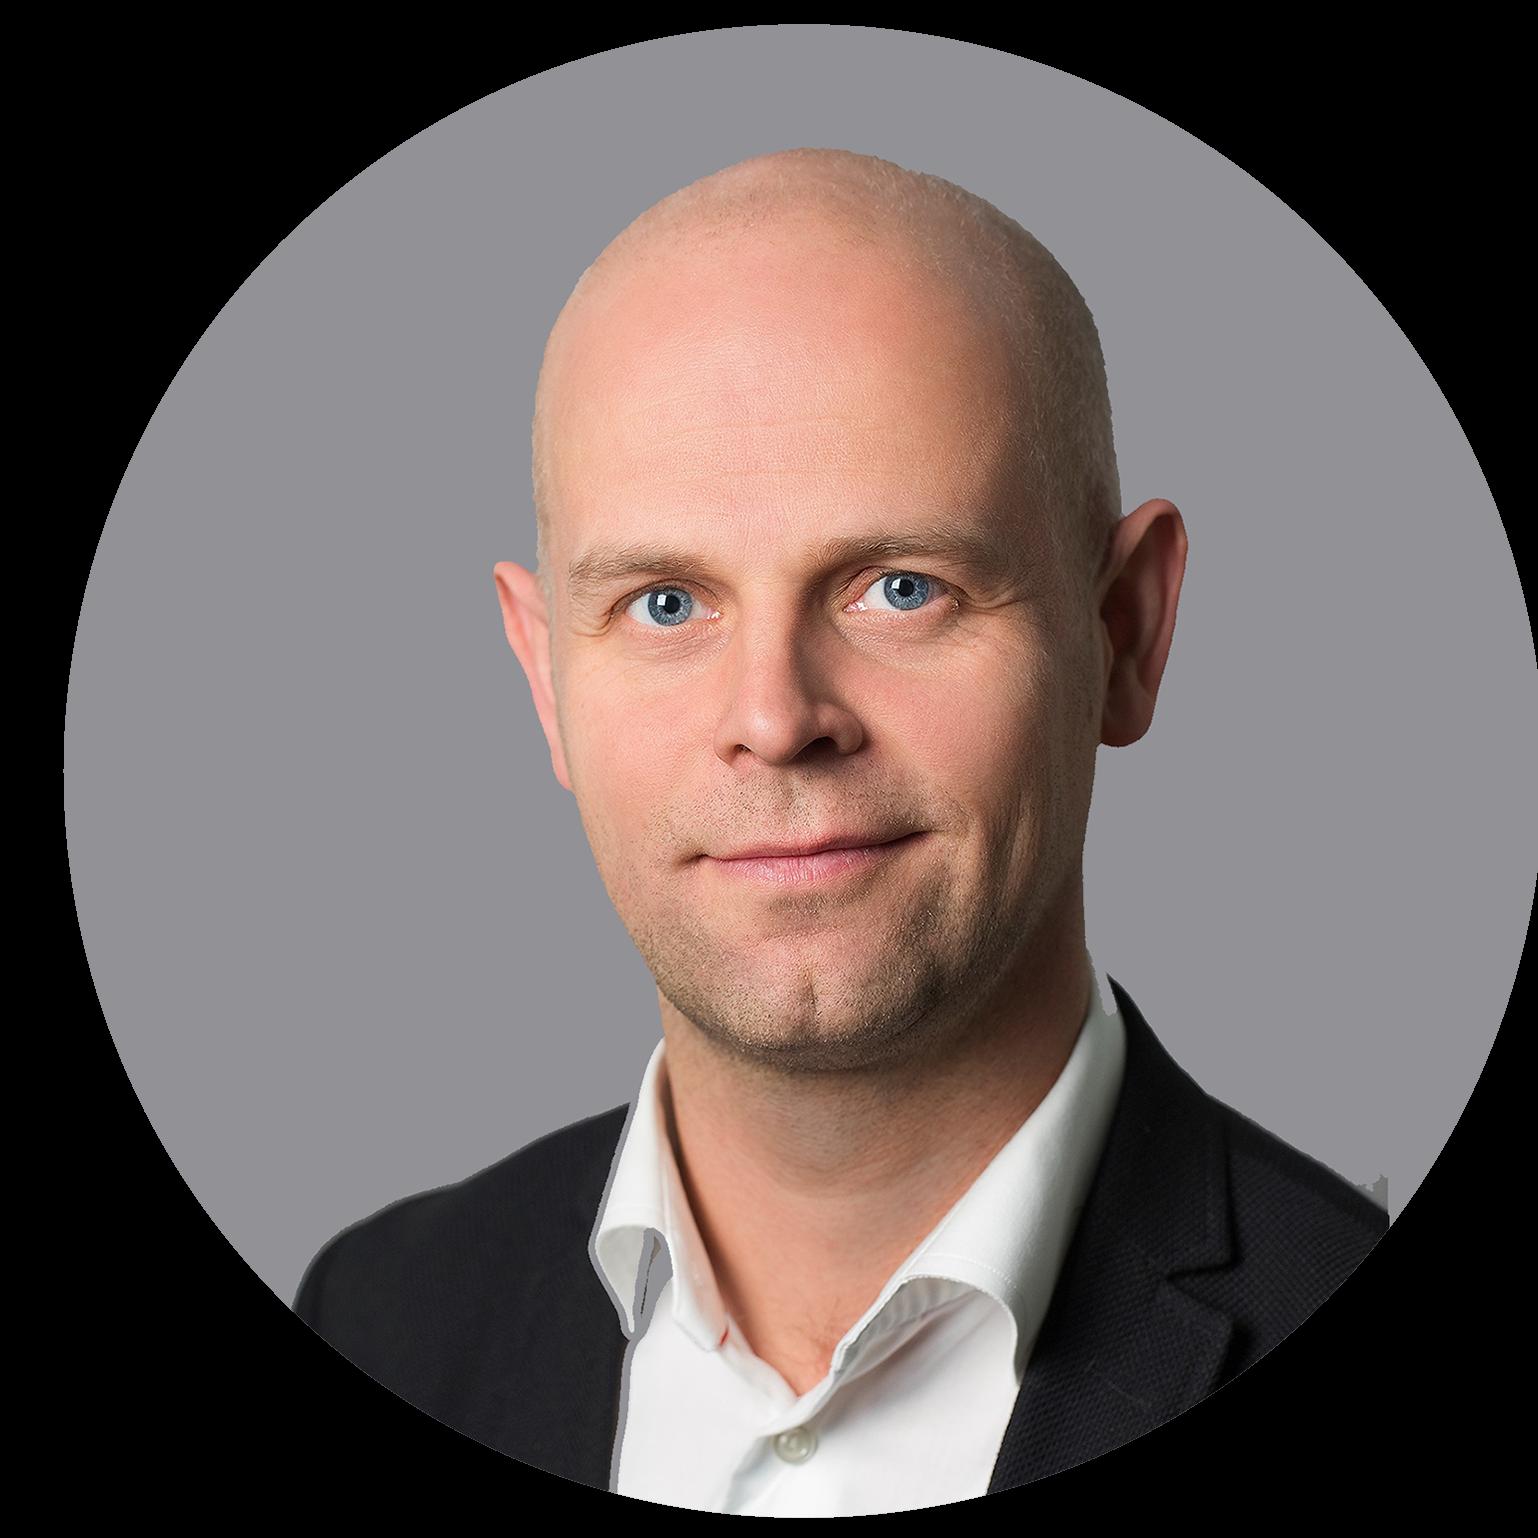 Fredrik Östbye